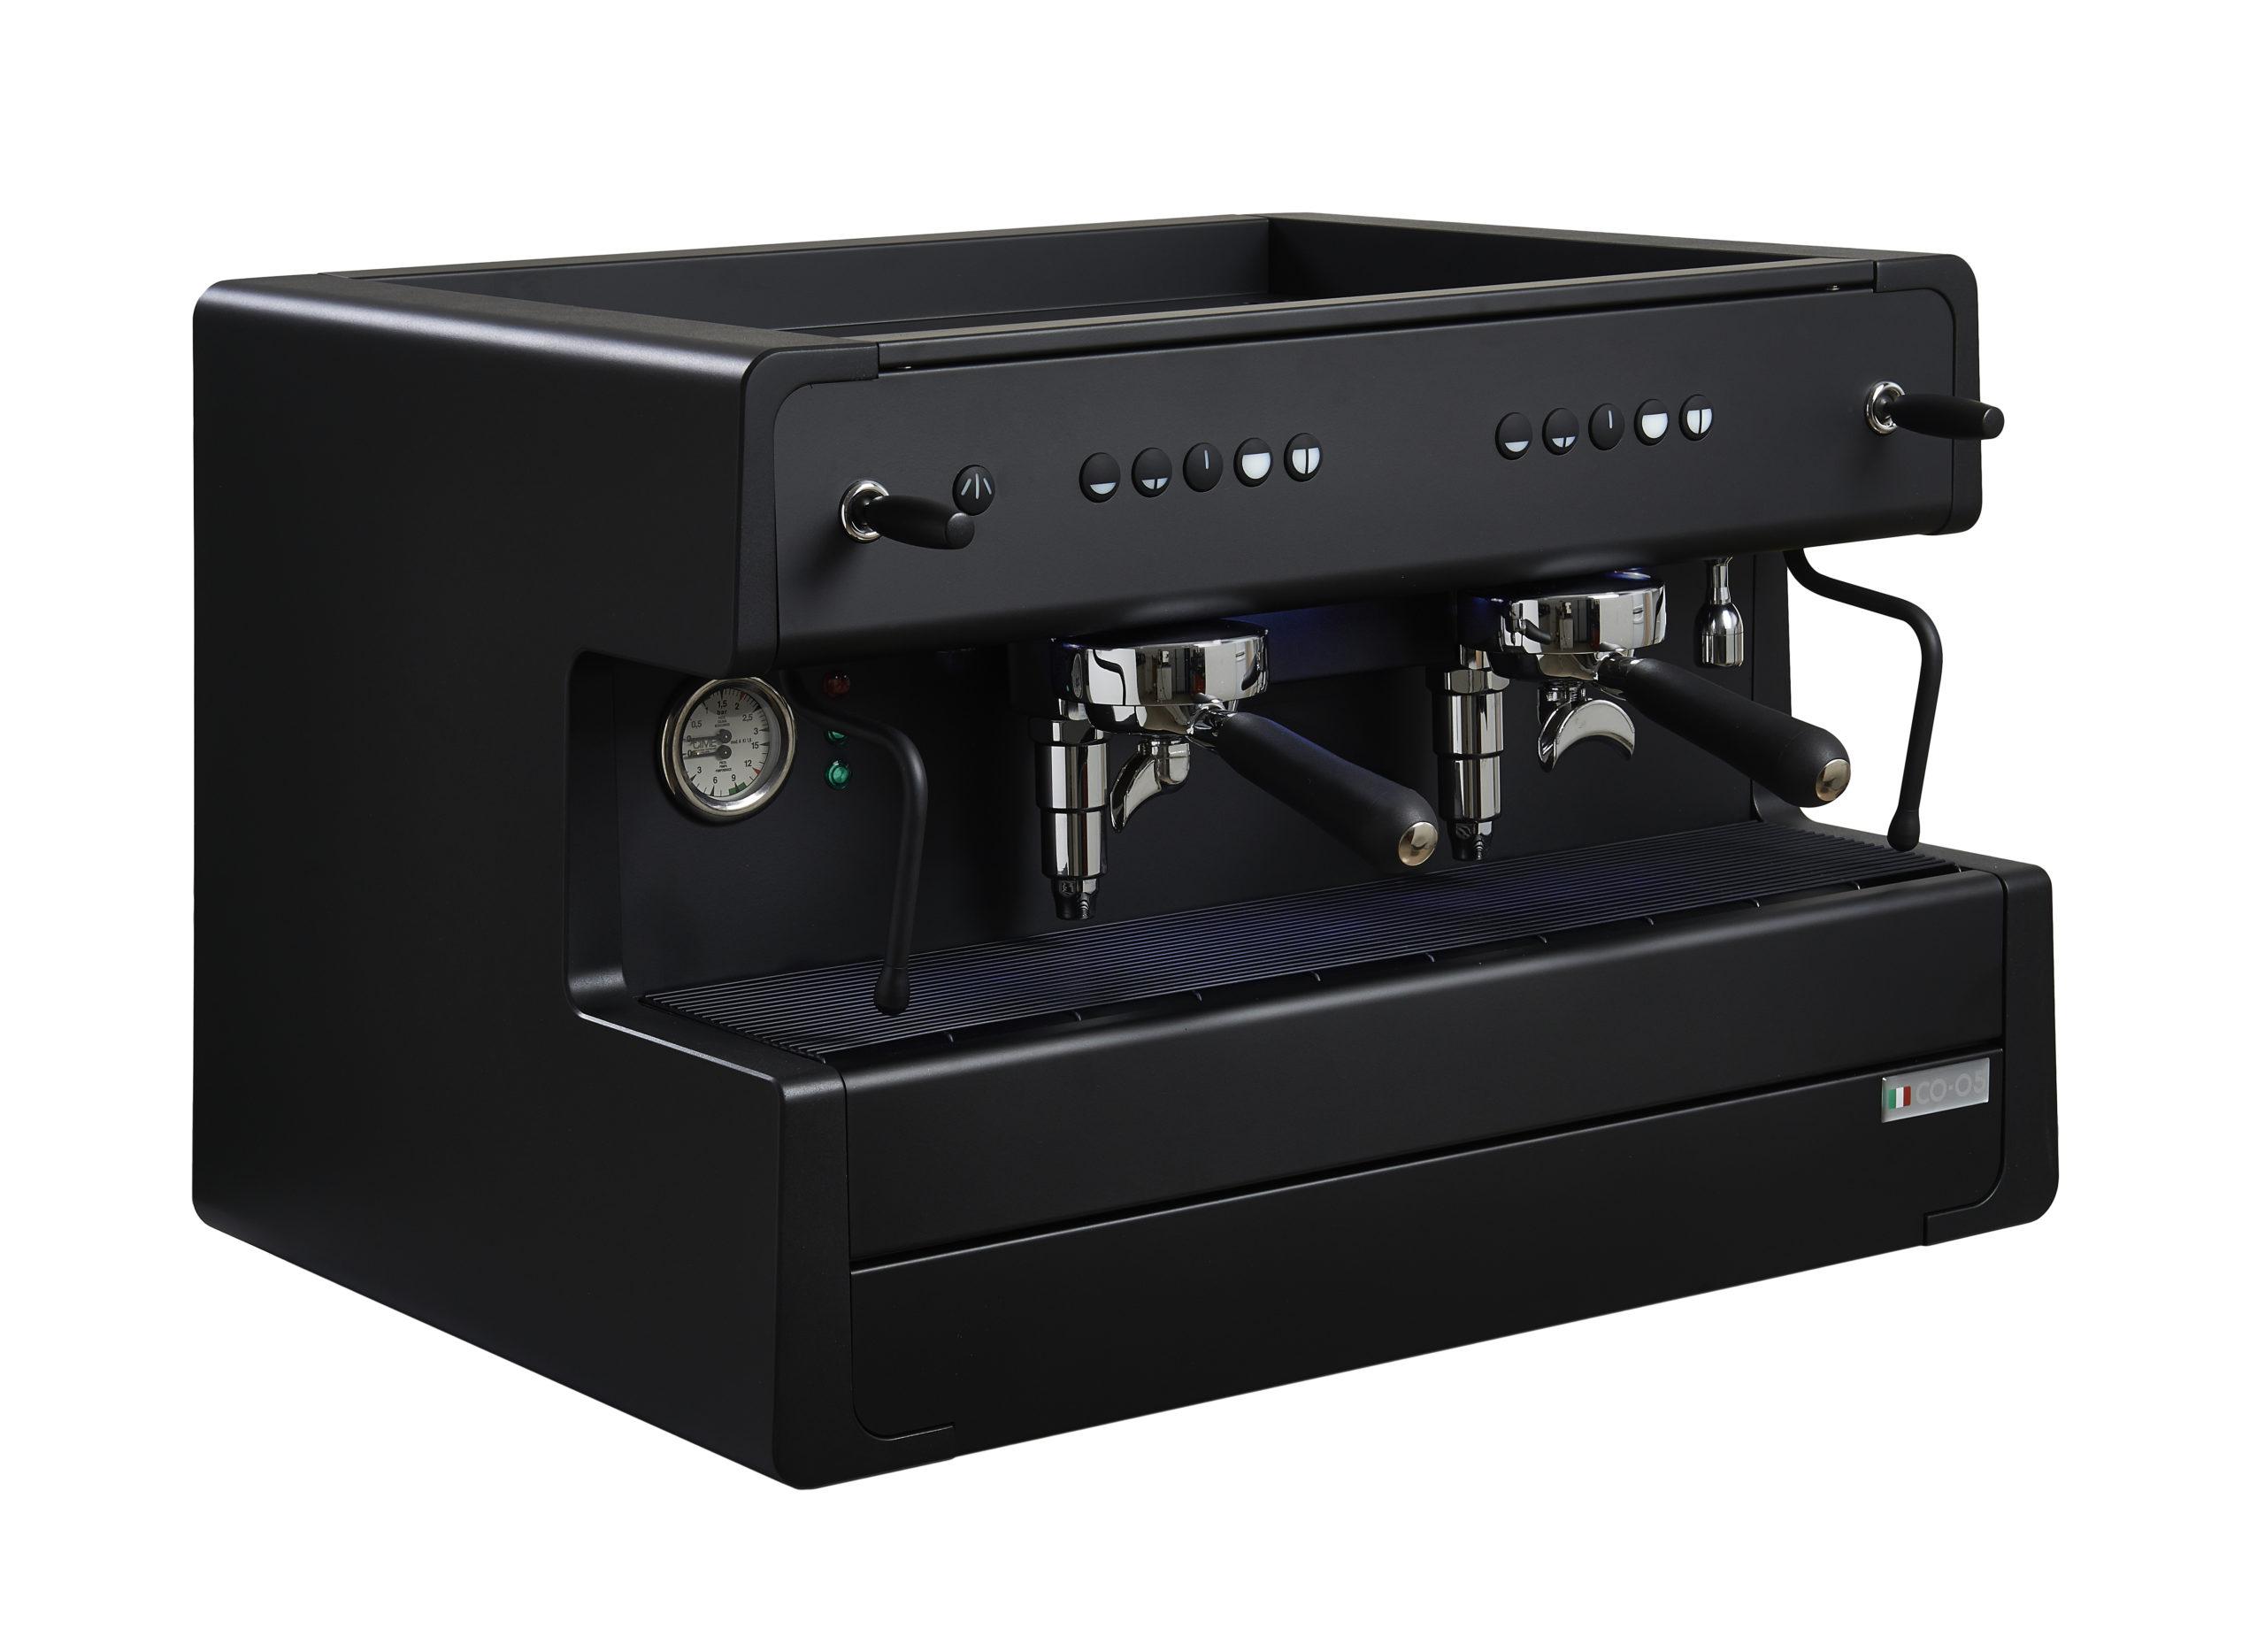 Machine Cime 05 Total Black